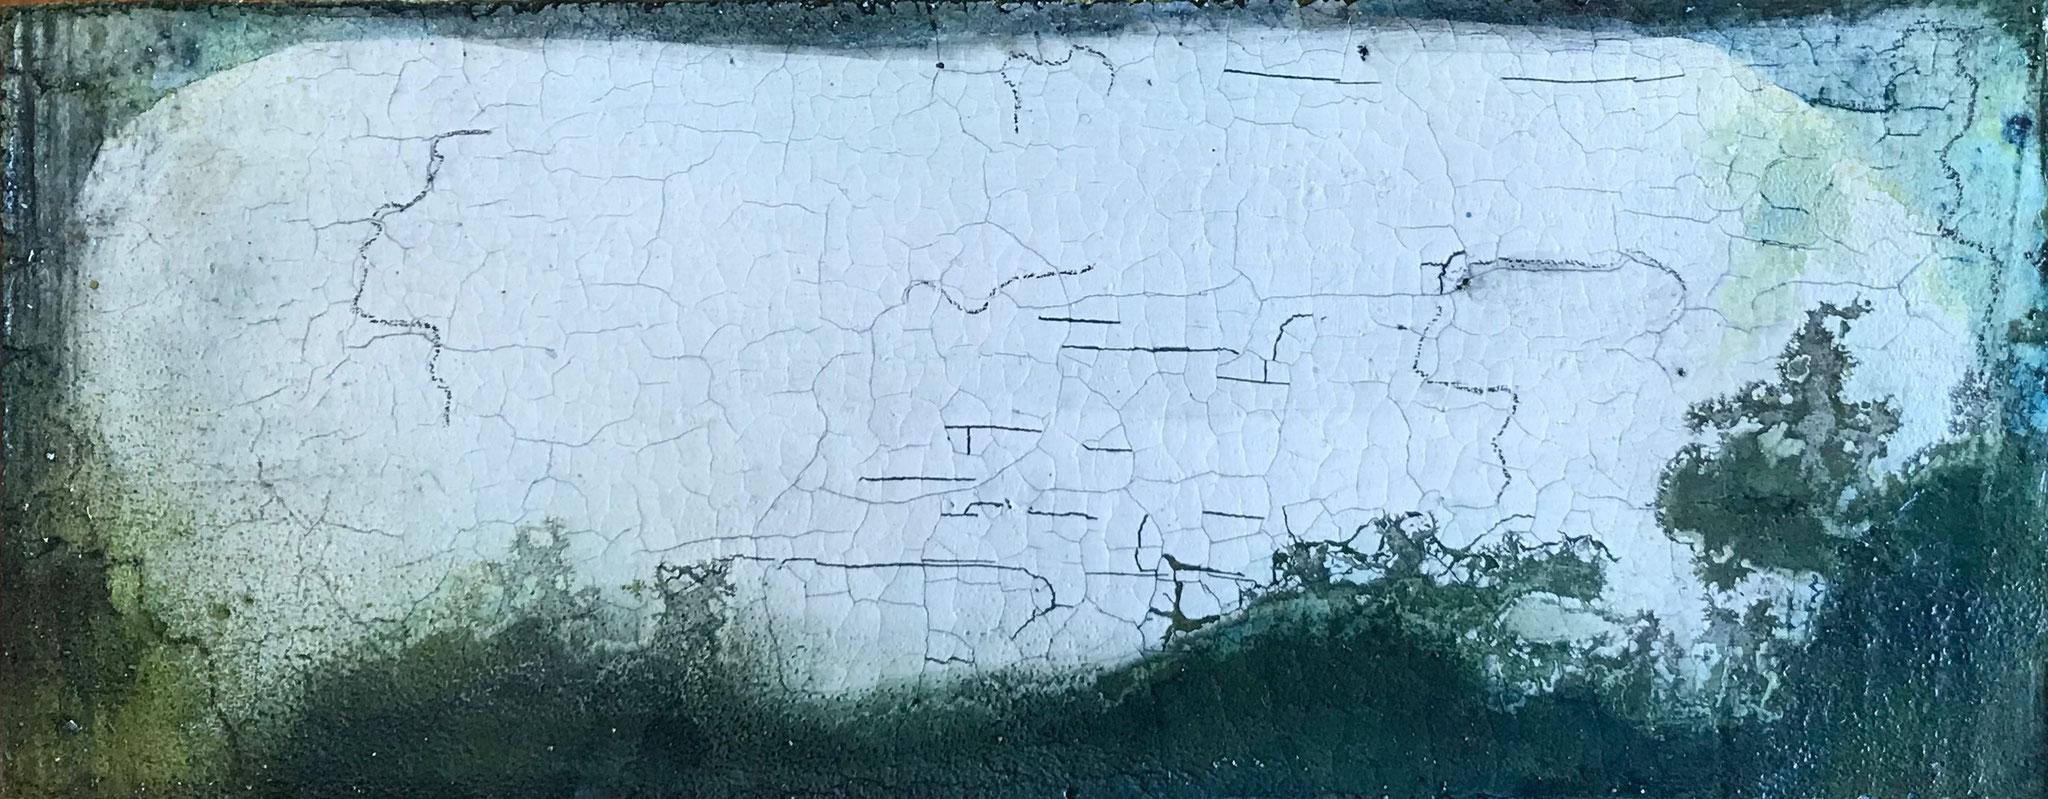 #4 Stiftkiste - rechteckig - ca. 22 x 8,5 x 3 cm (L/B/H)